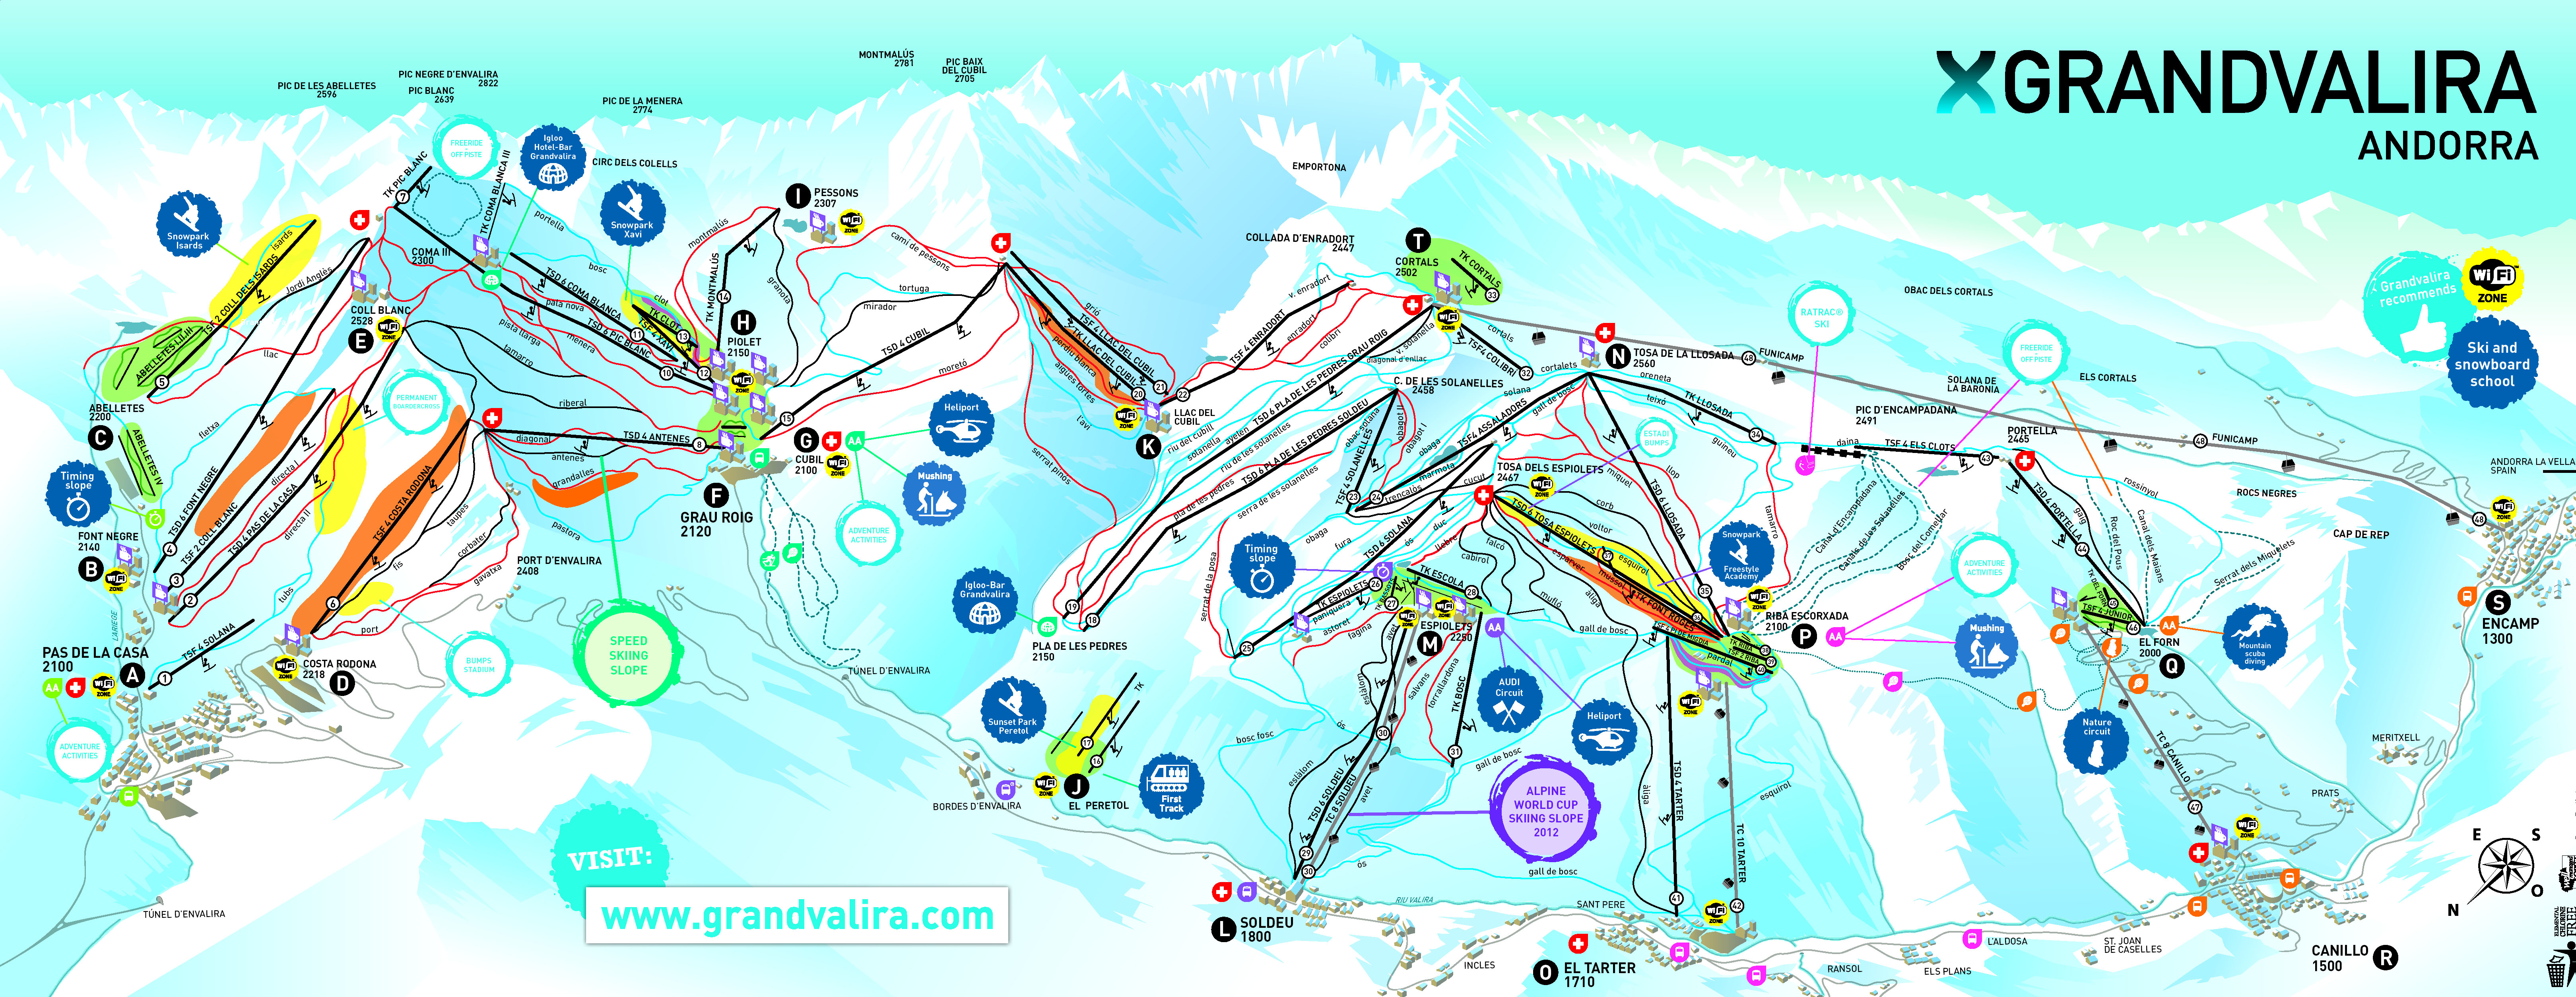 grandvalira-map.jpg